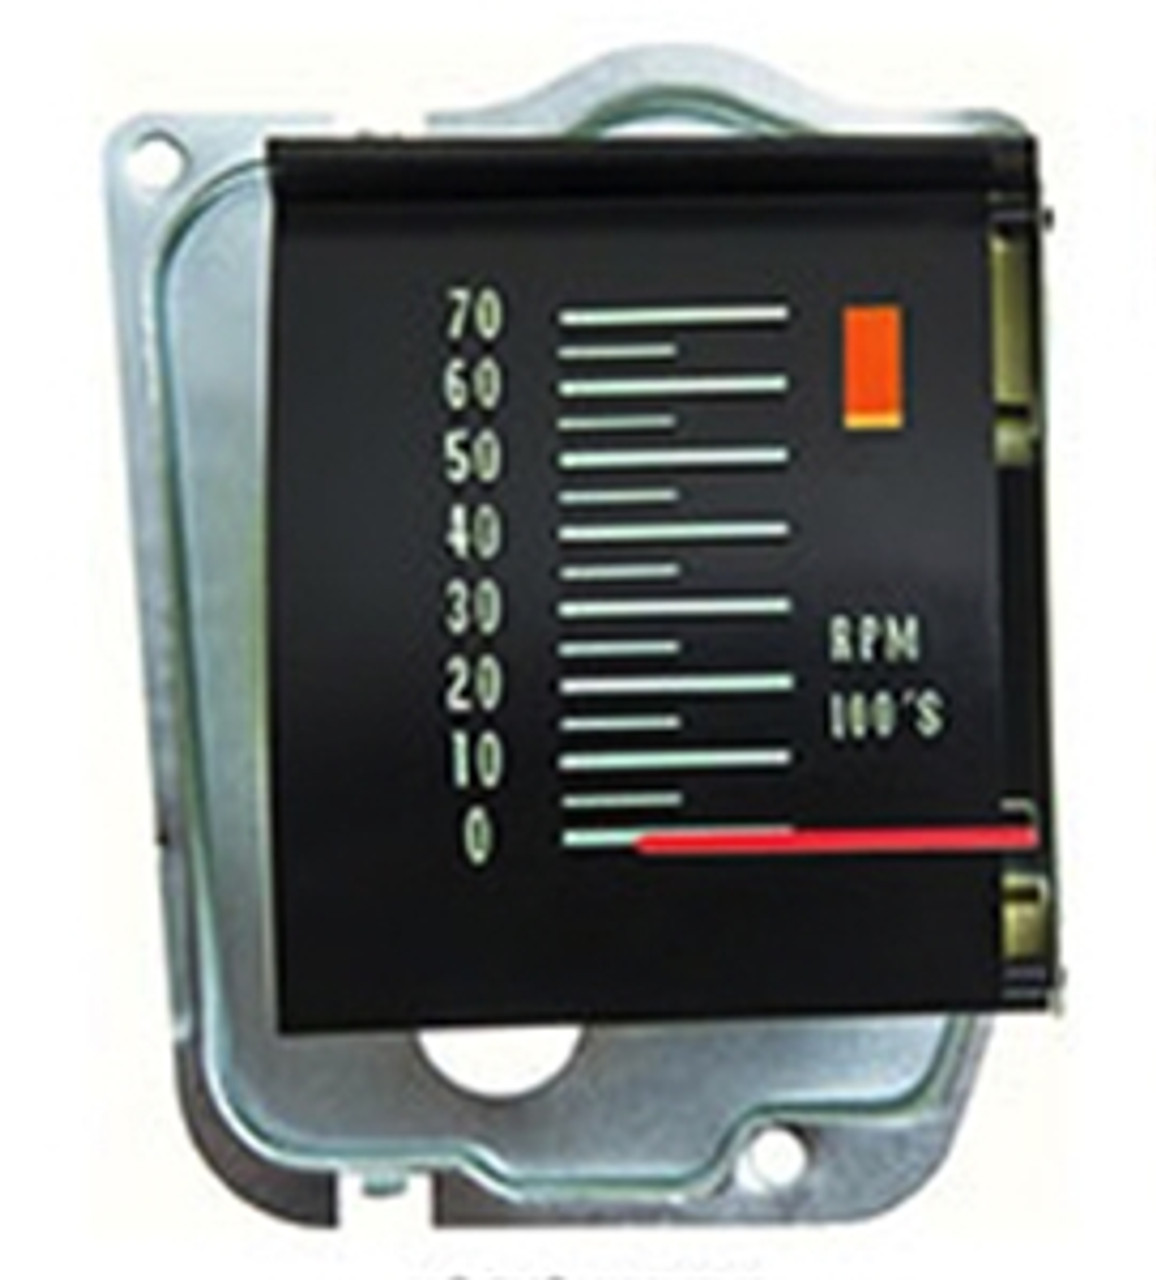 1968 Chevelle & El Camino Roller tach tachometer (5500 Redline)